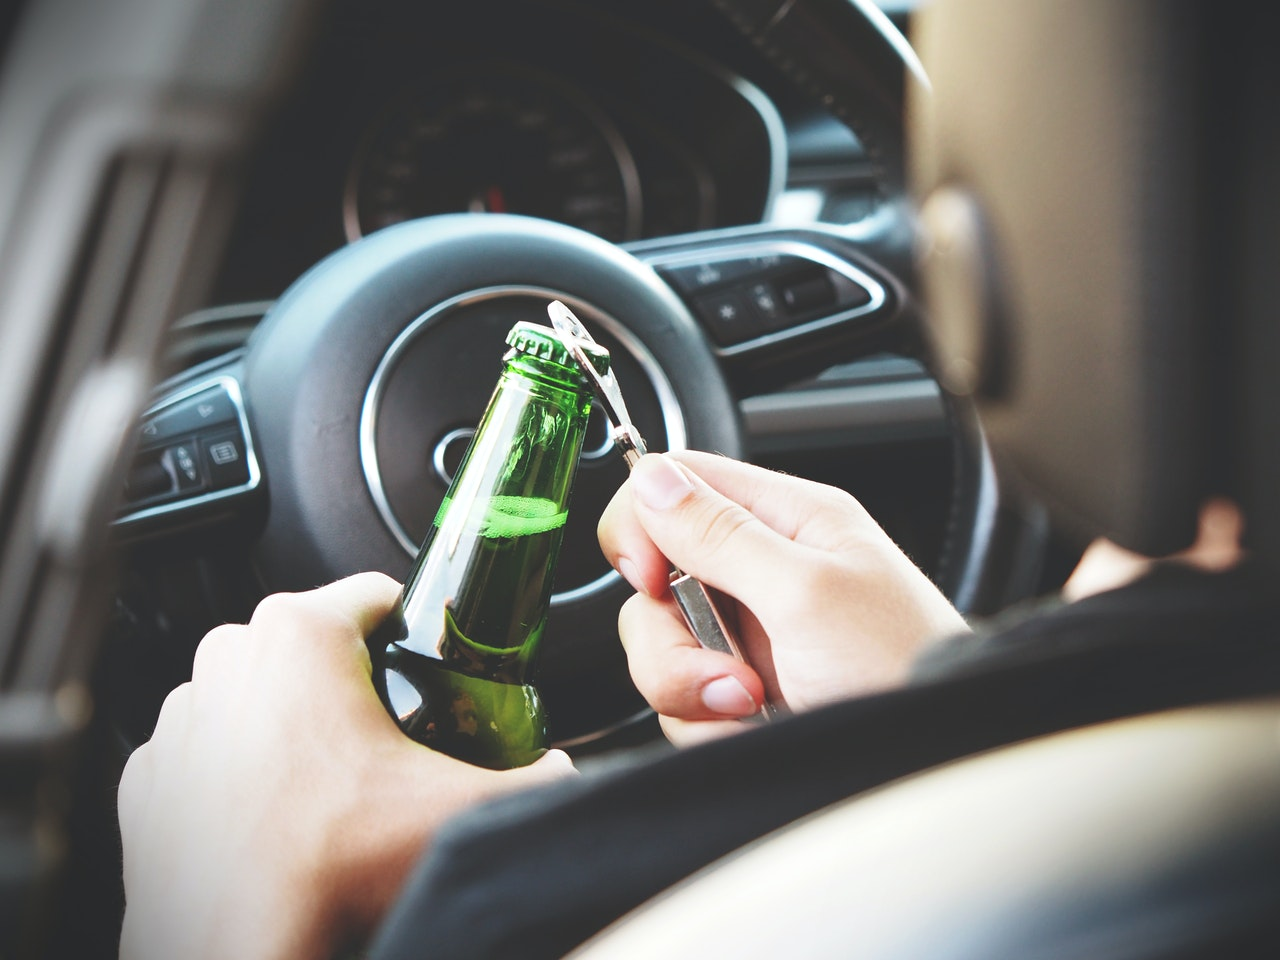 Vozač (68) u Bjelovaru napuhao skoro 4 promila!